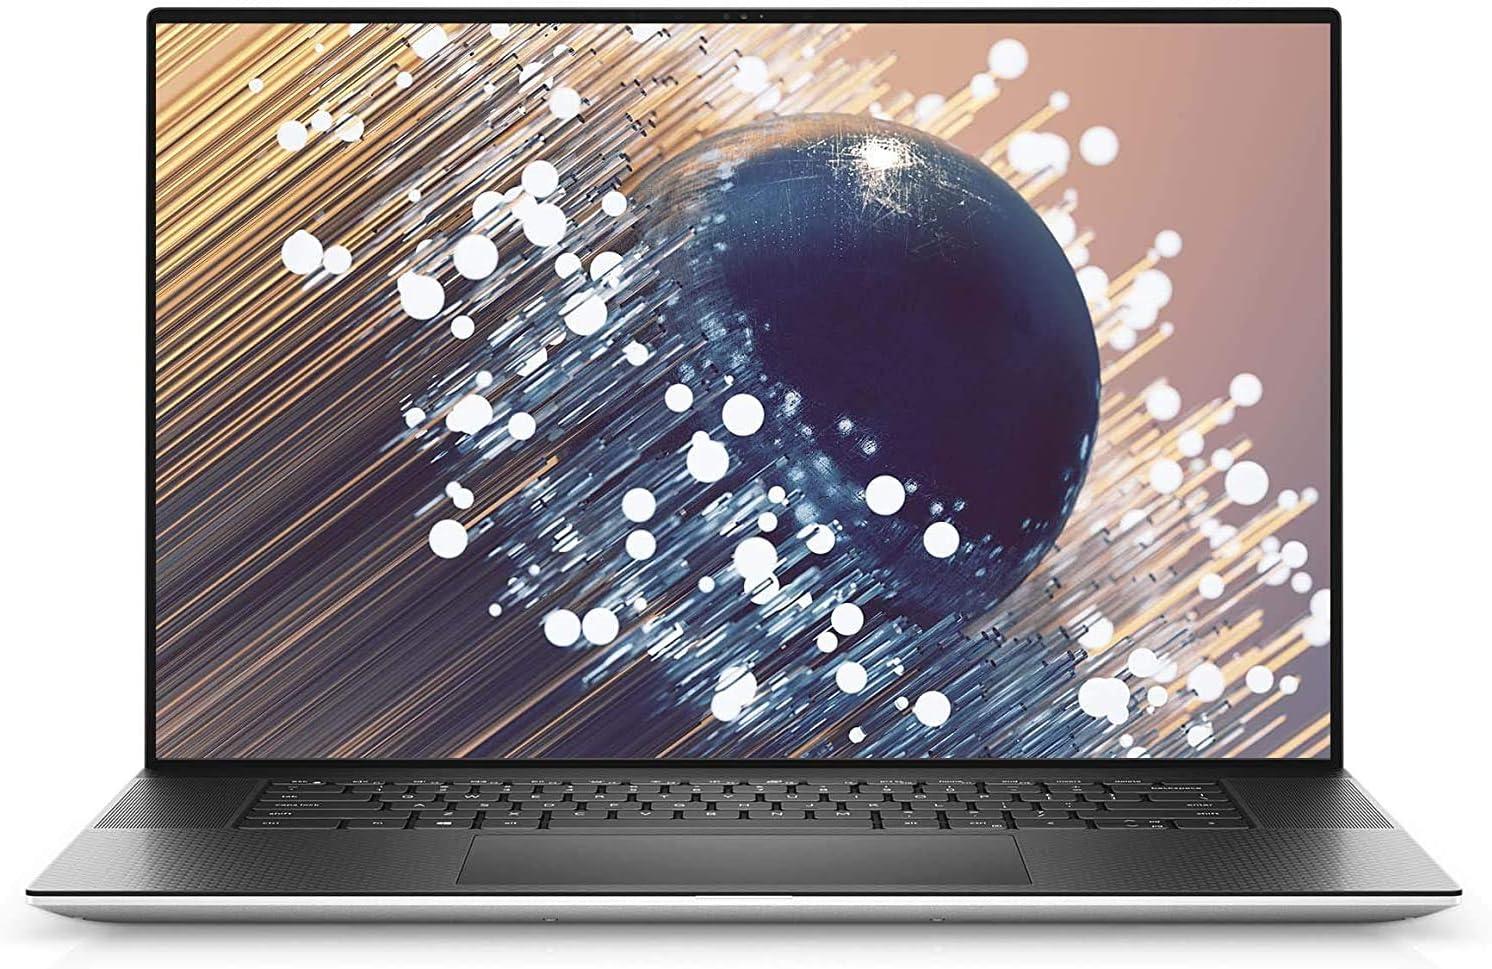 New Dell XPS 17 9700 17 inch UHD Plus Laptop (Silver) Intel i7-10750H 10th Gen, 32GB DDR4 RAM, 1TB SSD, NVIDIA GeForce RTX 1650 Ti 4GB GDDR6, Windows 10 Home